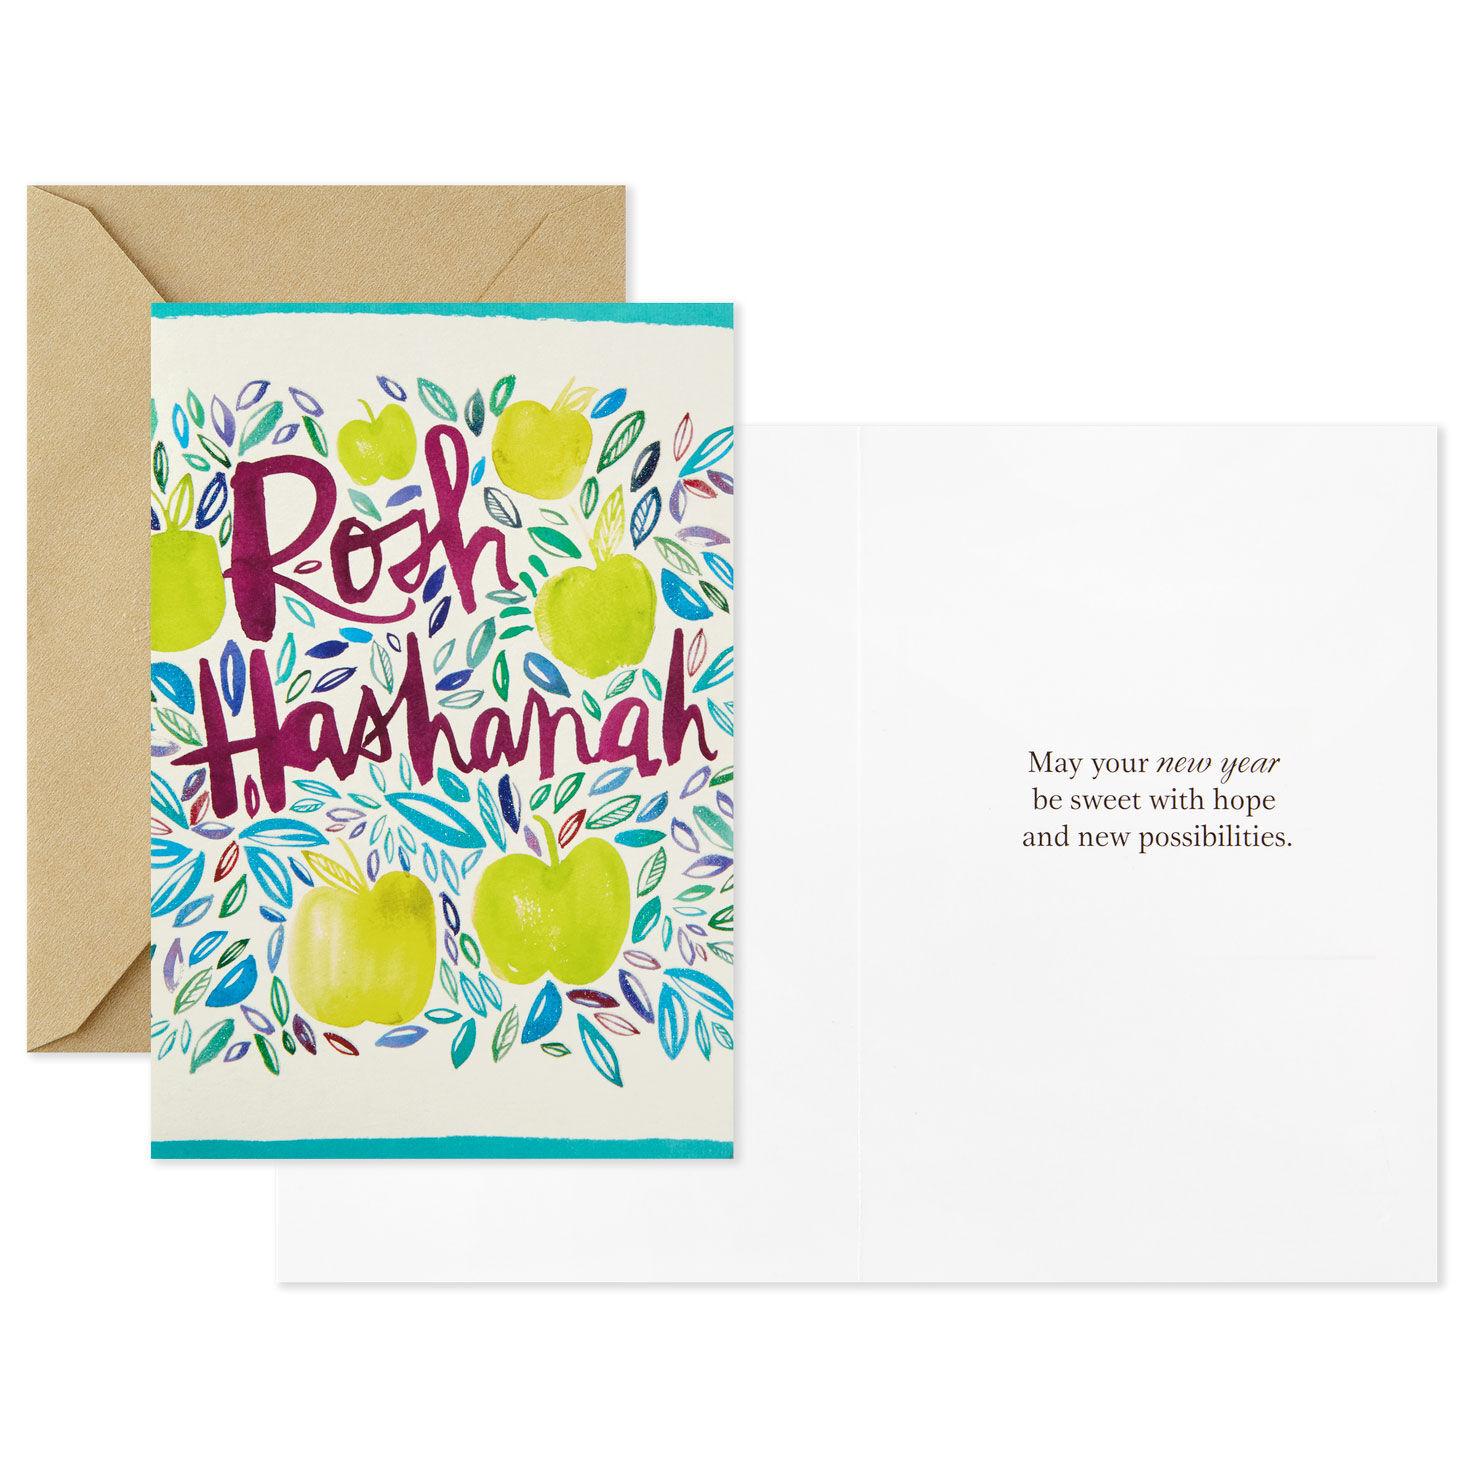 graphic regarding Rosh Hashanah Greeting Cards Printable referred to as Rosh Hashanah Jewish Fresh new Yr Hallmark